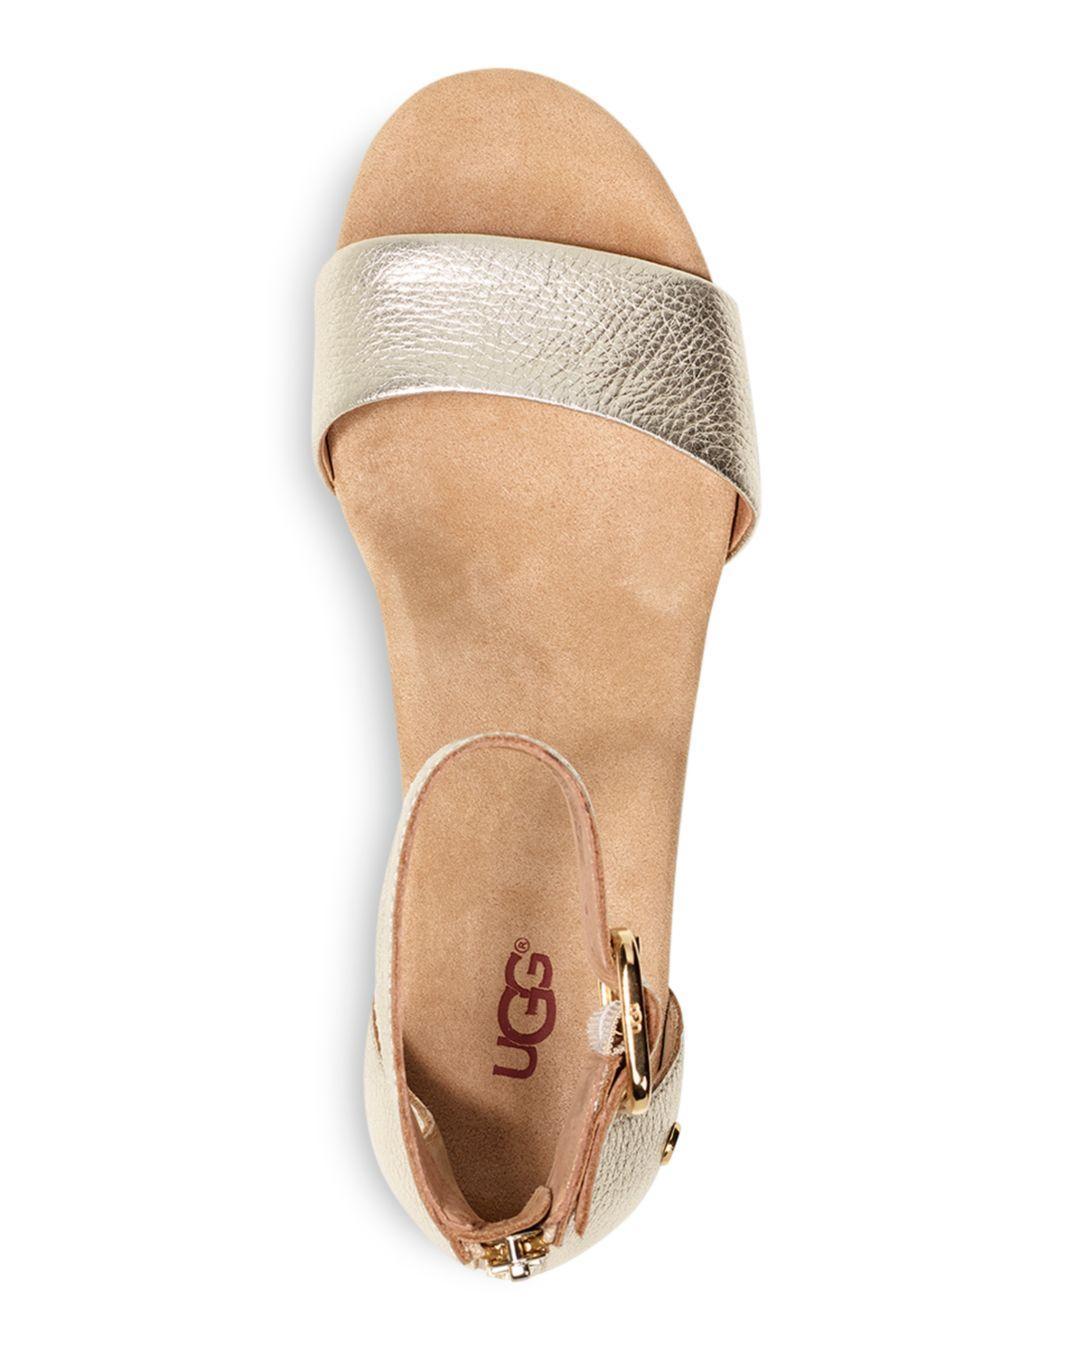 cb5f71b1aff Ugg - Women s Zoe Ii Metallic Leather Cork Wedge Ankle Strap Sandals -  Lyst. View fullscreen